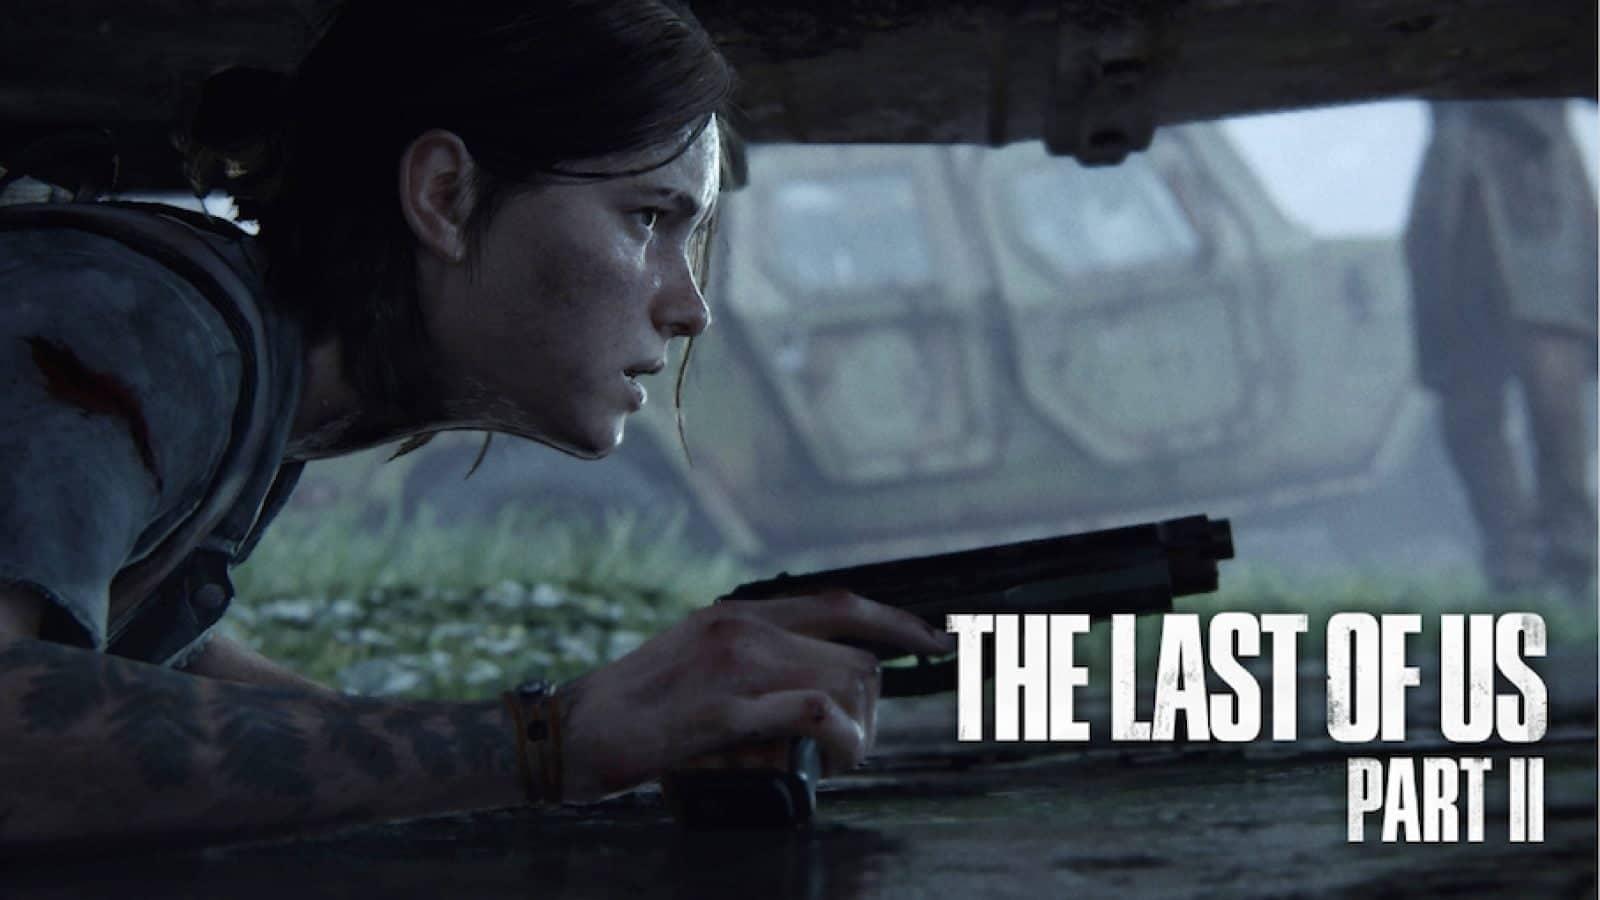 The Last of Us parte 2 Otro rumor fija el estreno del videojuego